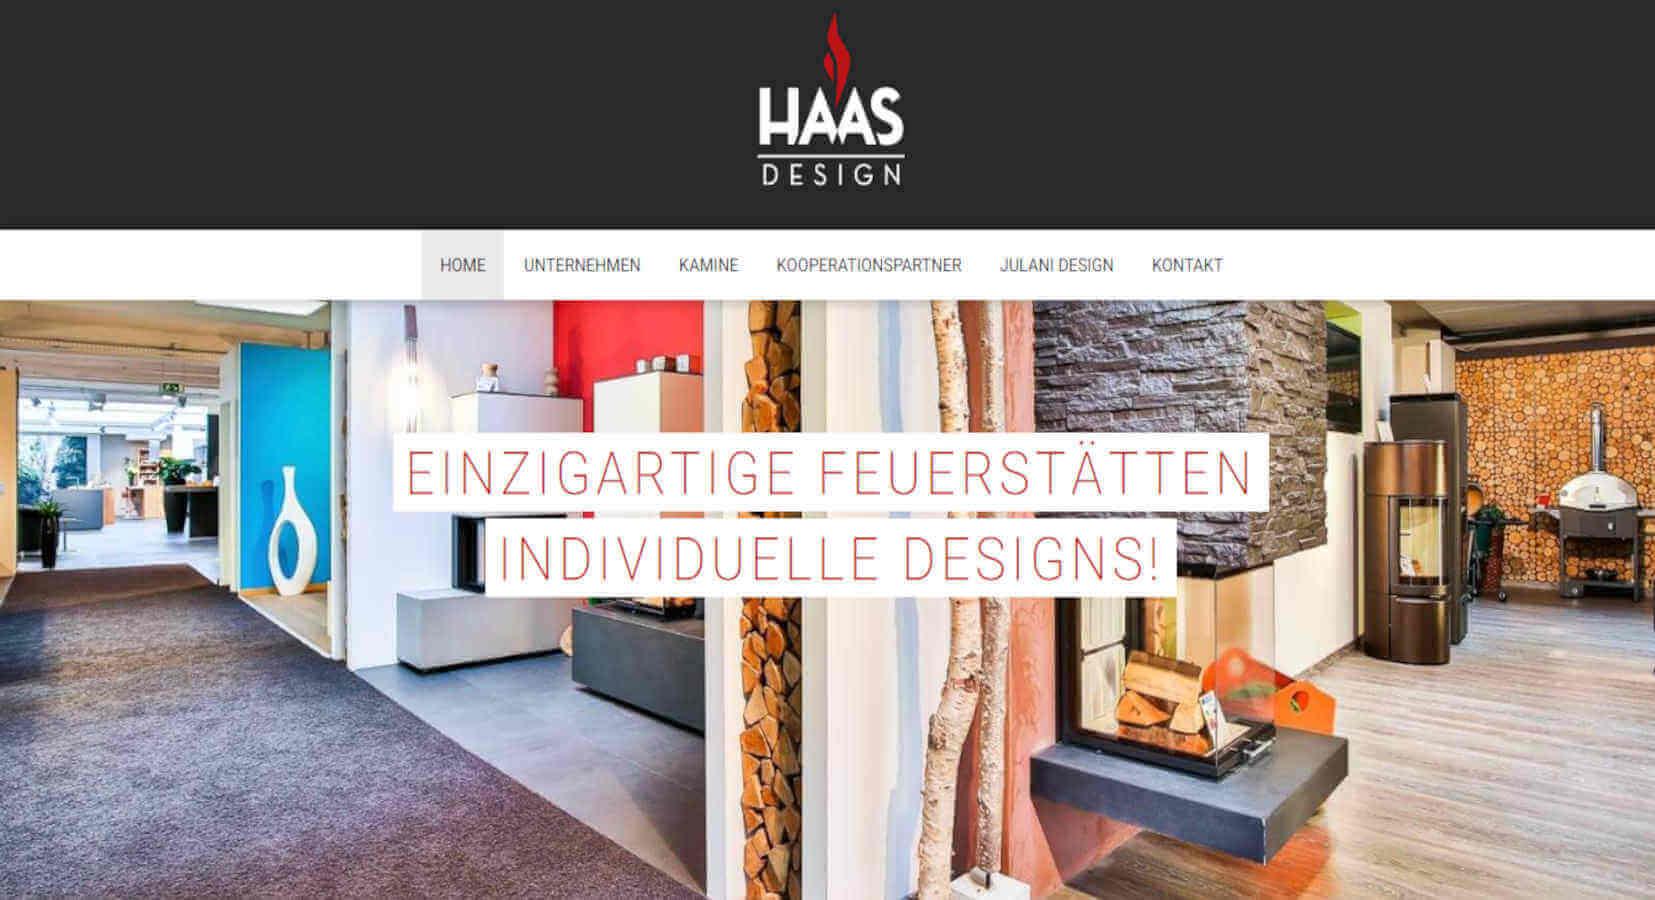 Haas Design GmbH